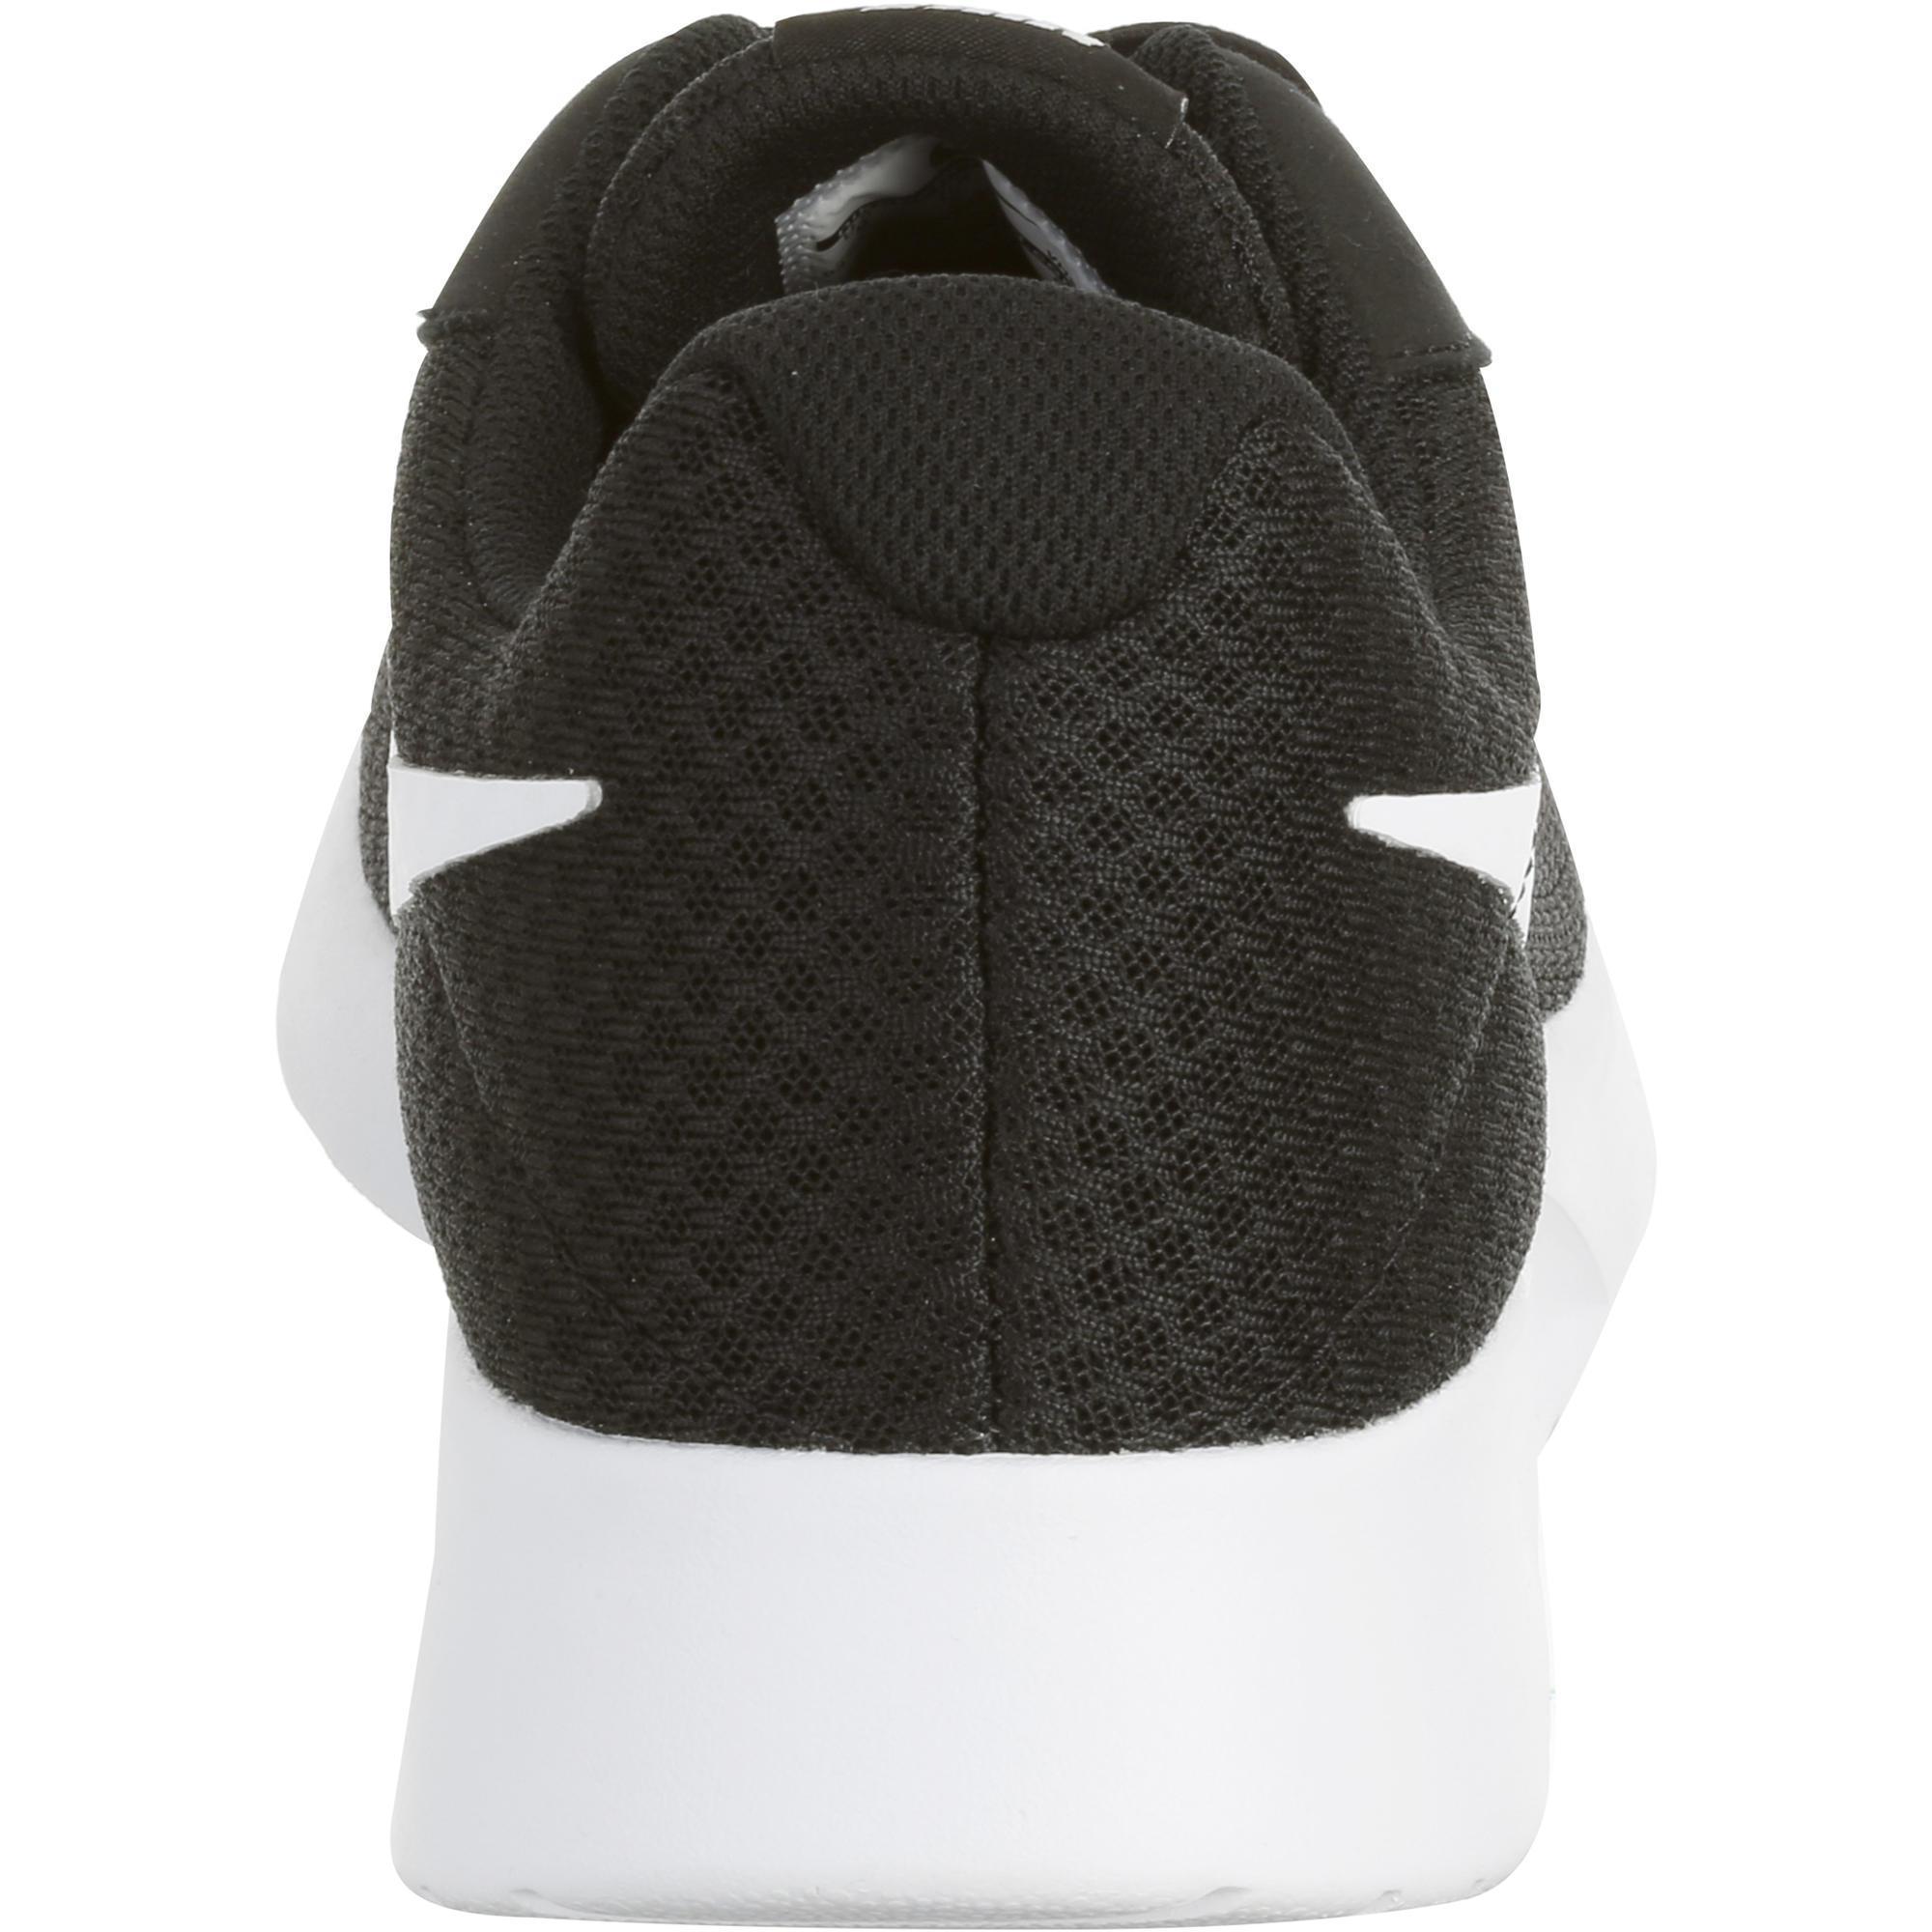 size 40 e7f67 a86c8 Blanc Marche Tanjun Sportive Chaussures Noir Nike Homme Decathlon 0txqrvn0